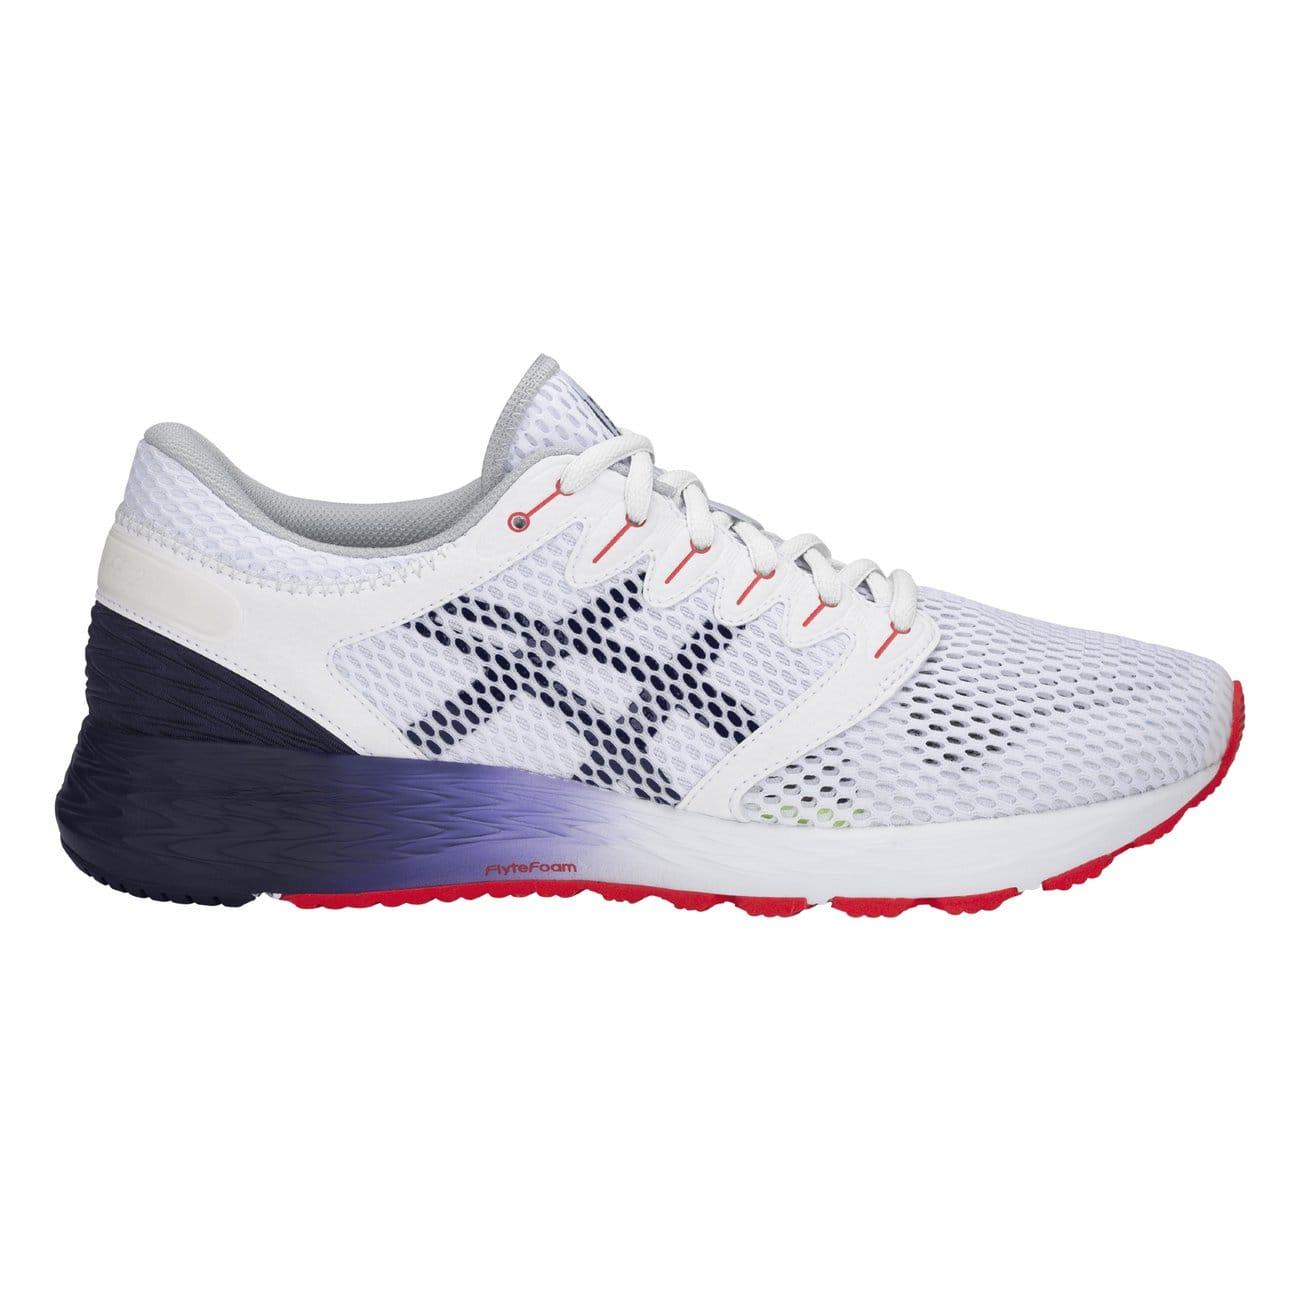 Chaussures de running Asics Roadhawk FF 2 pour Hommes - Diverses tailles